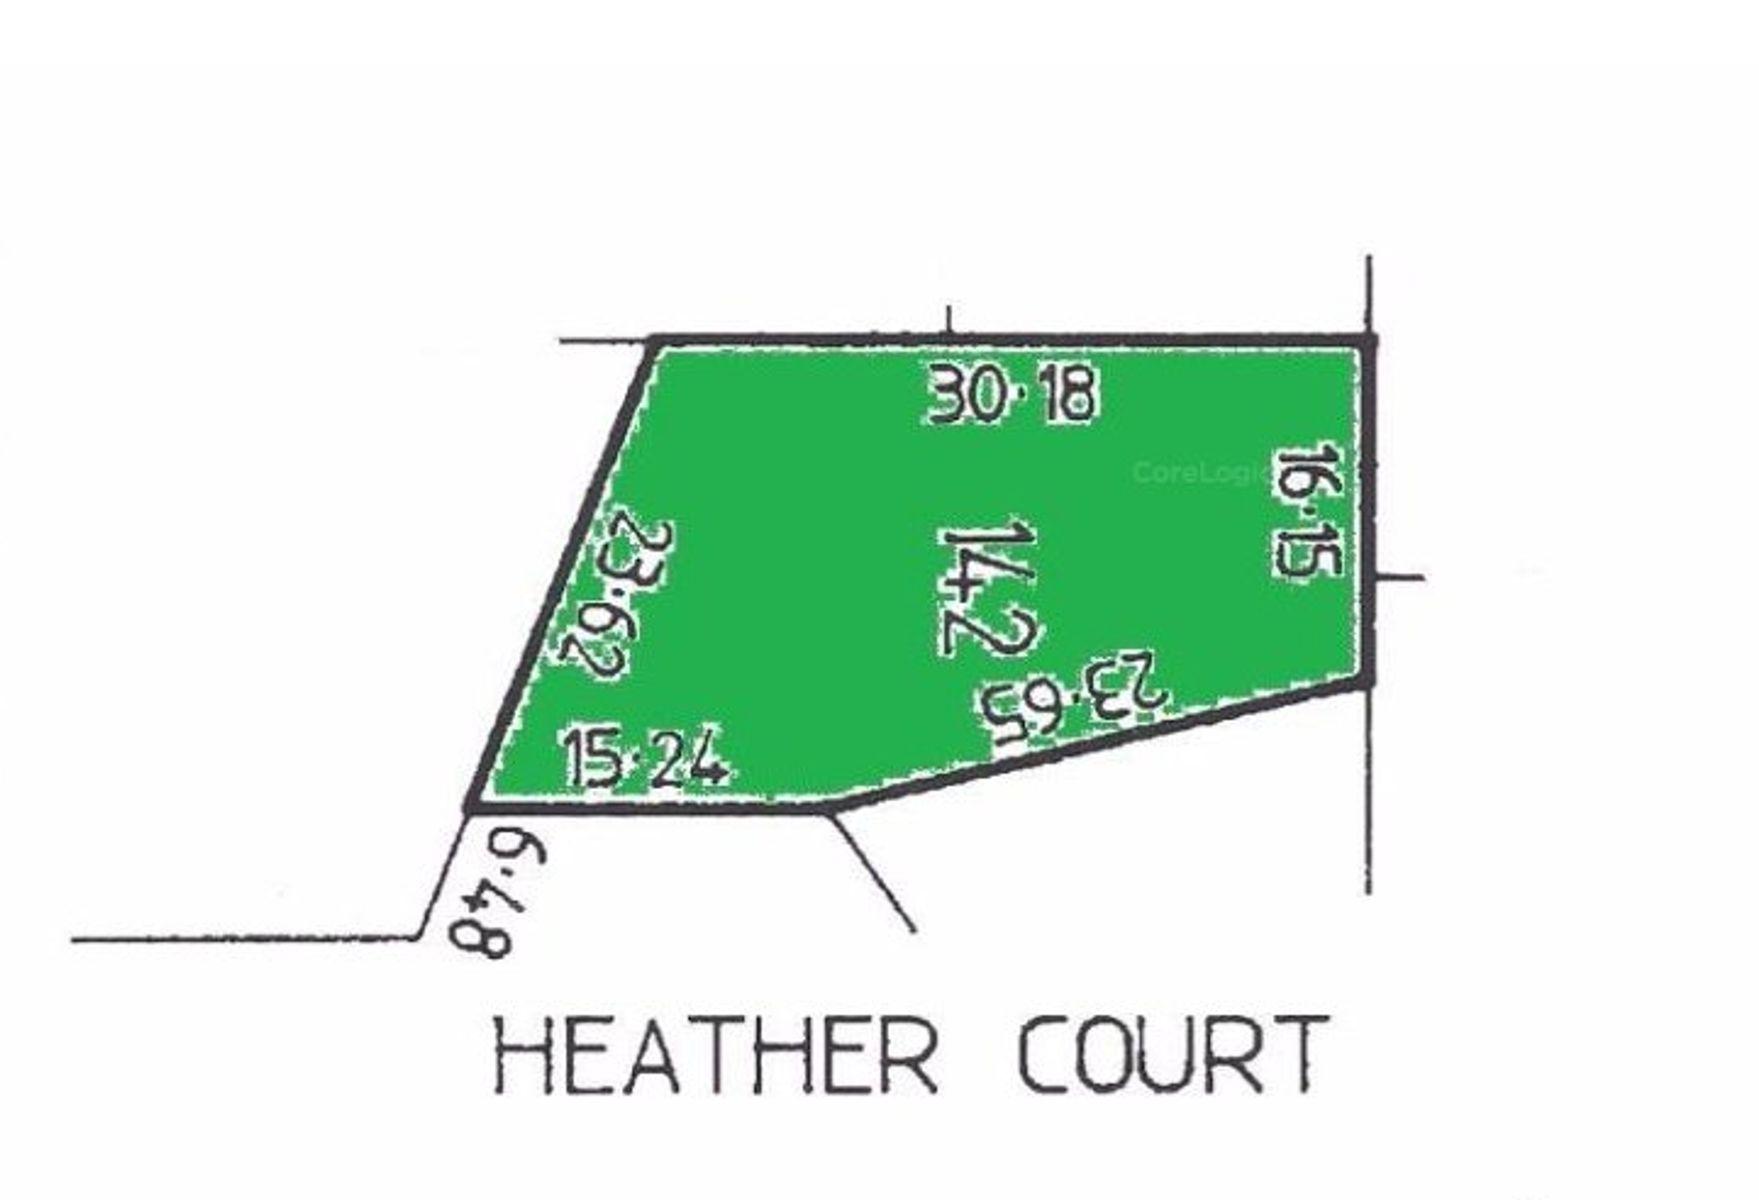 5 Heather Court, Para Vista, SA 5093